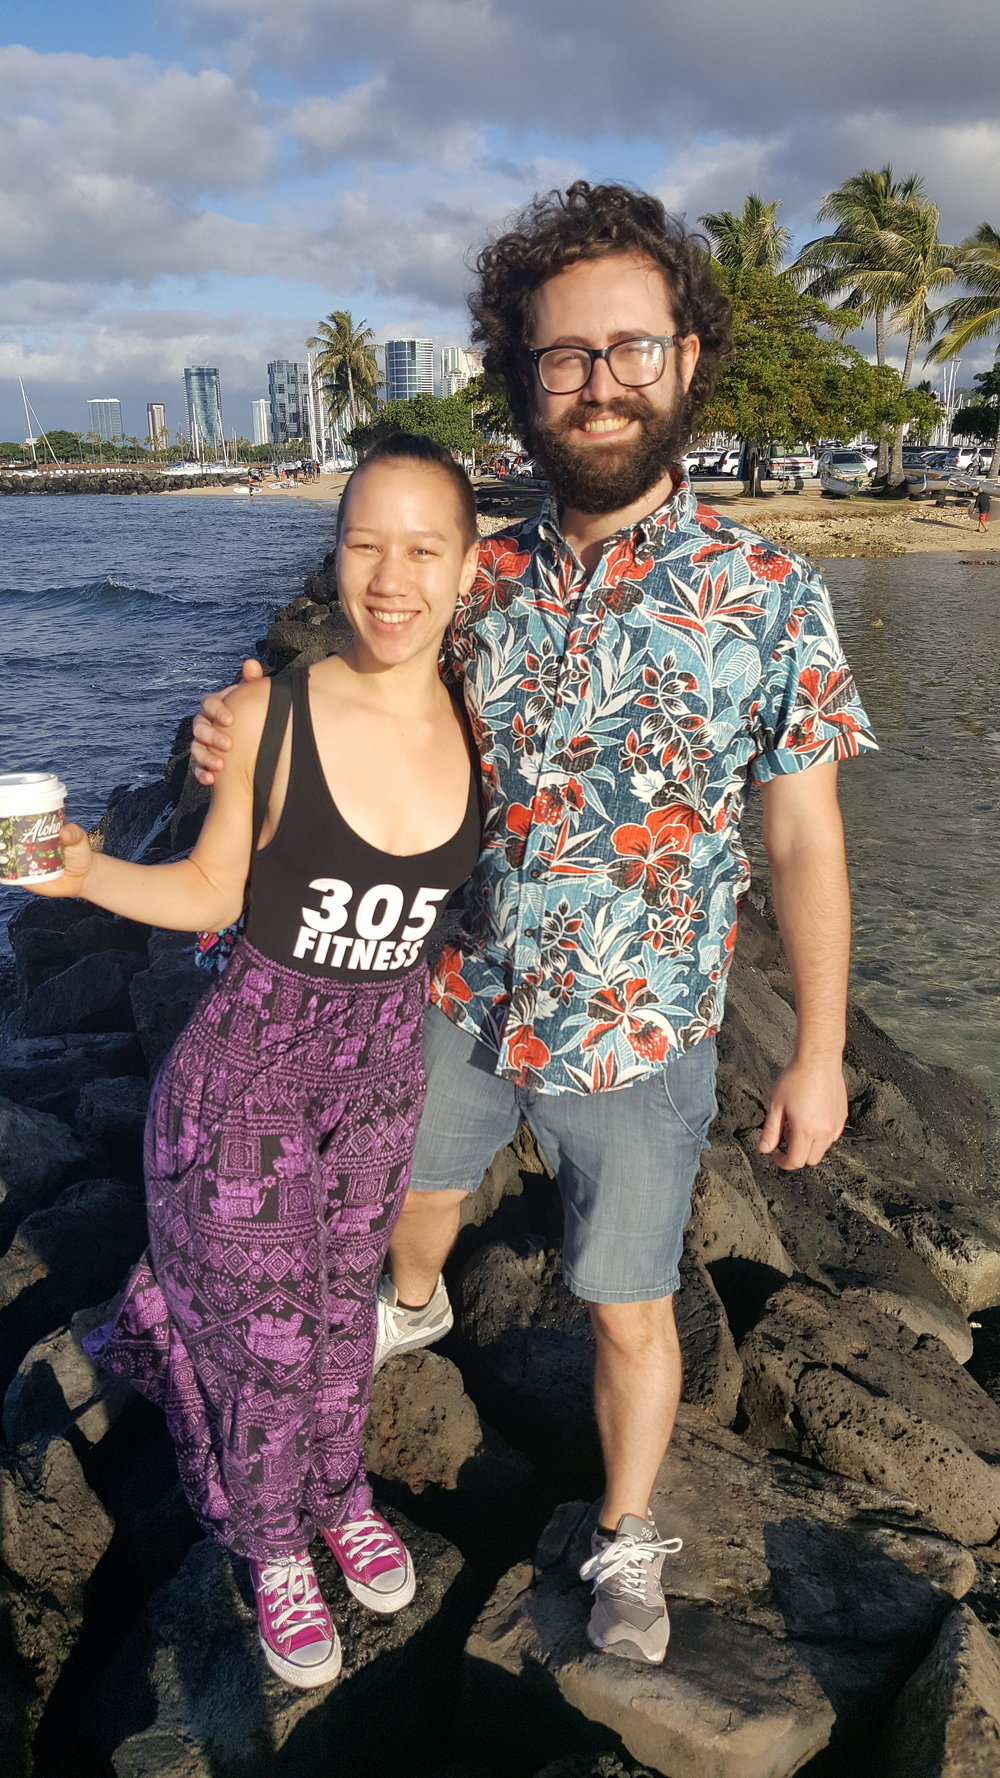 305 Fitness Instructor Wisty and Partner Julien